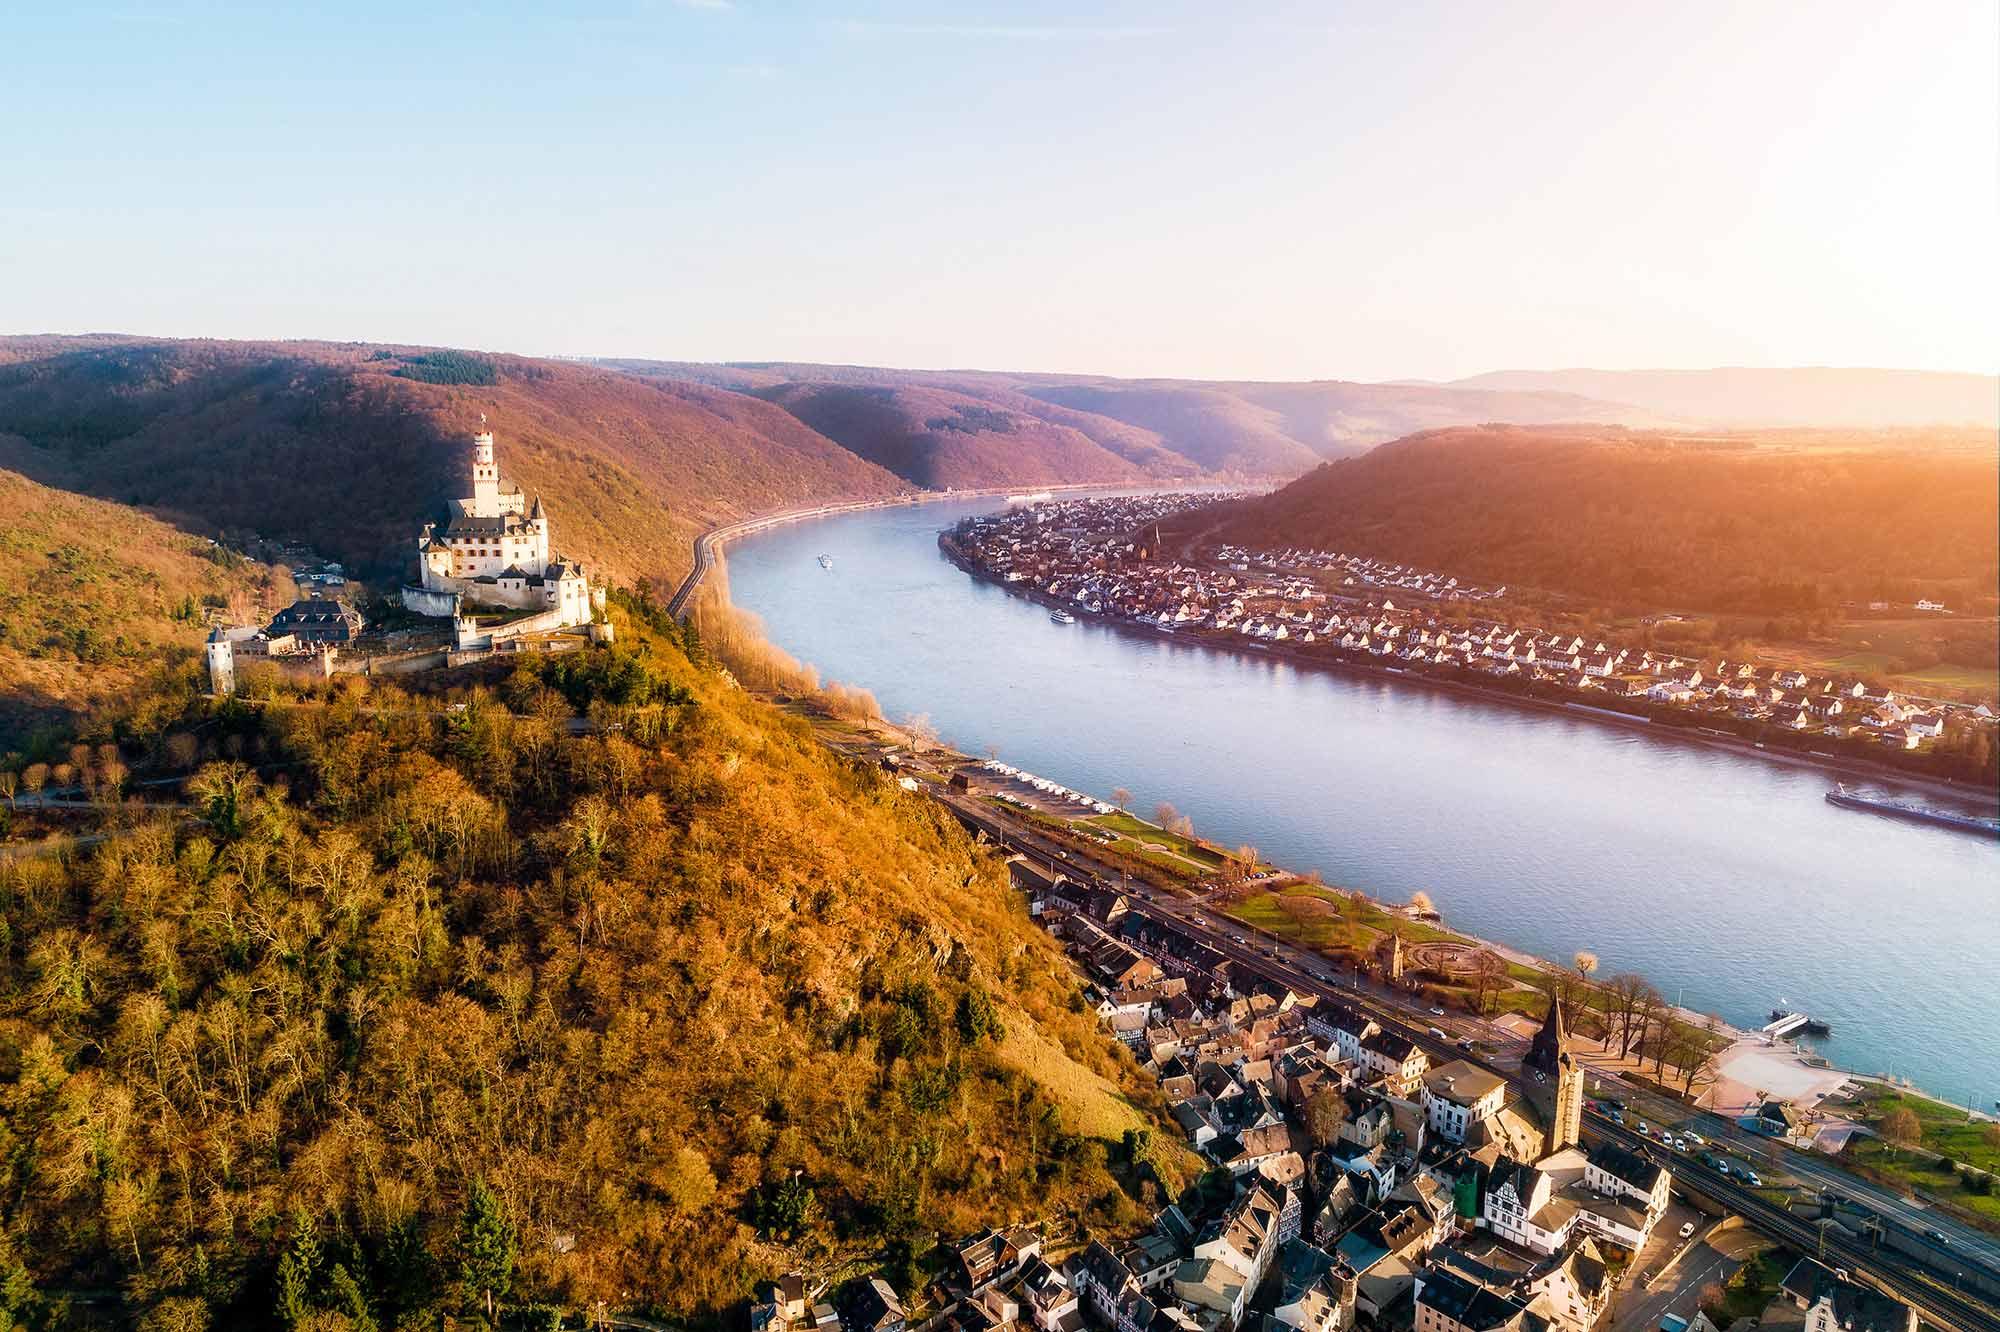 A great trip on the Rhine